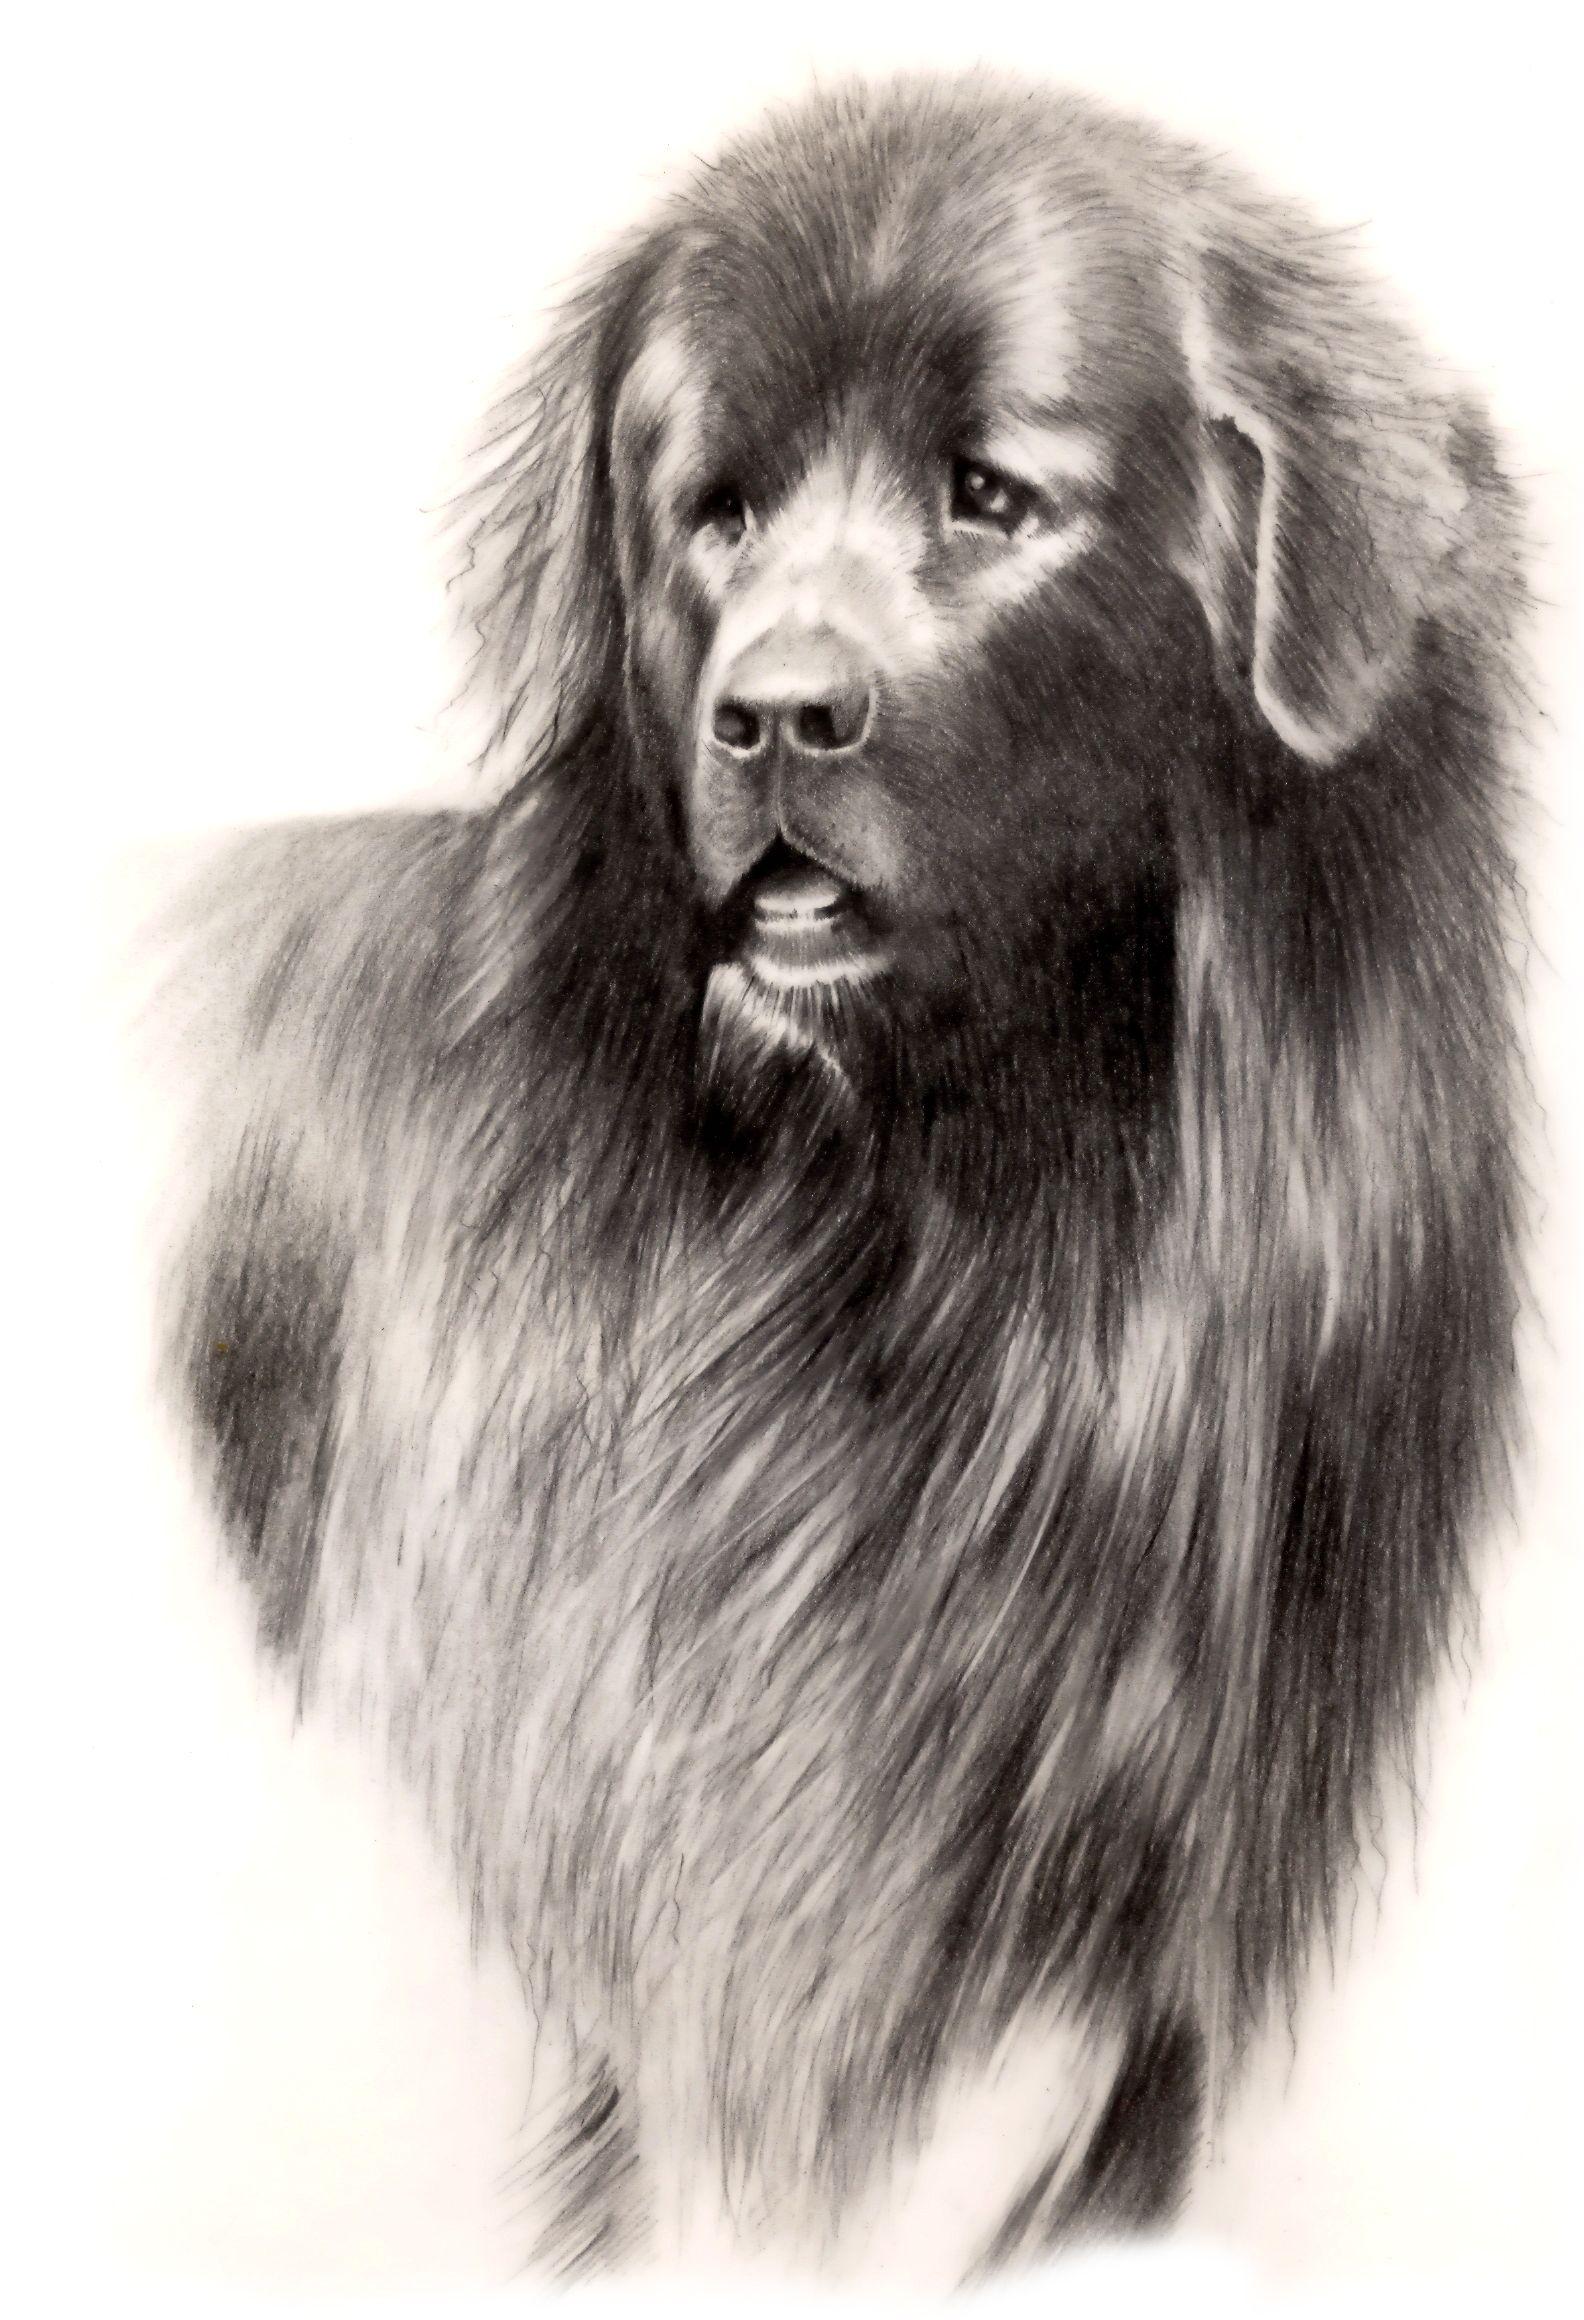 35 very beautiful newfoundland dog pictures - Gorgeous Dido Xxx Pencil By Barbara Simoes Of Newfoundland Dog